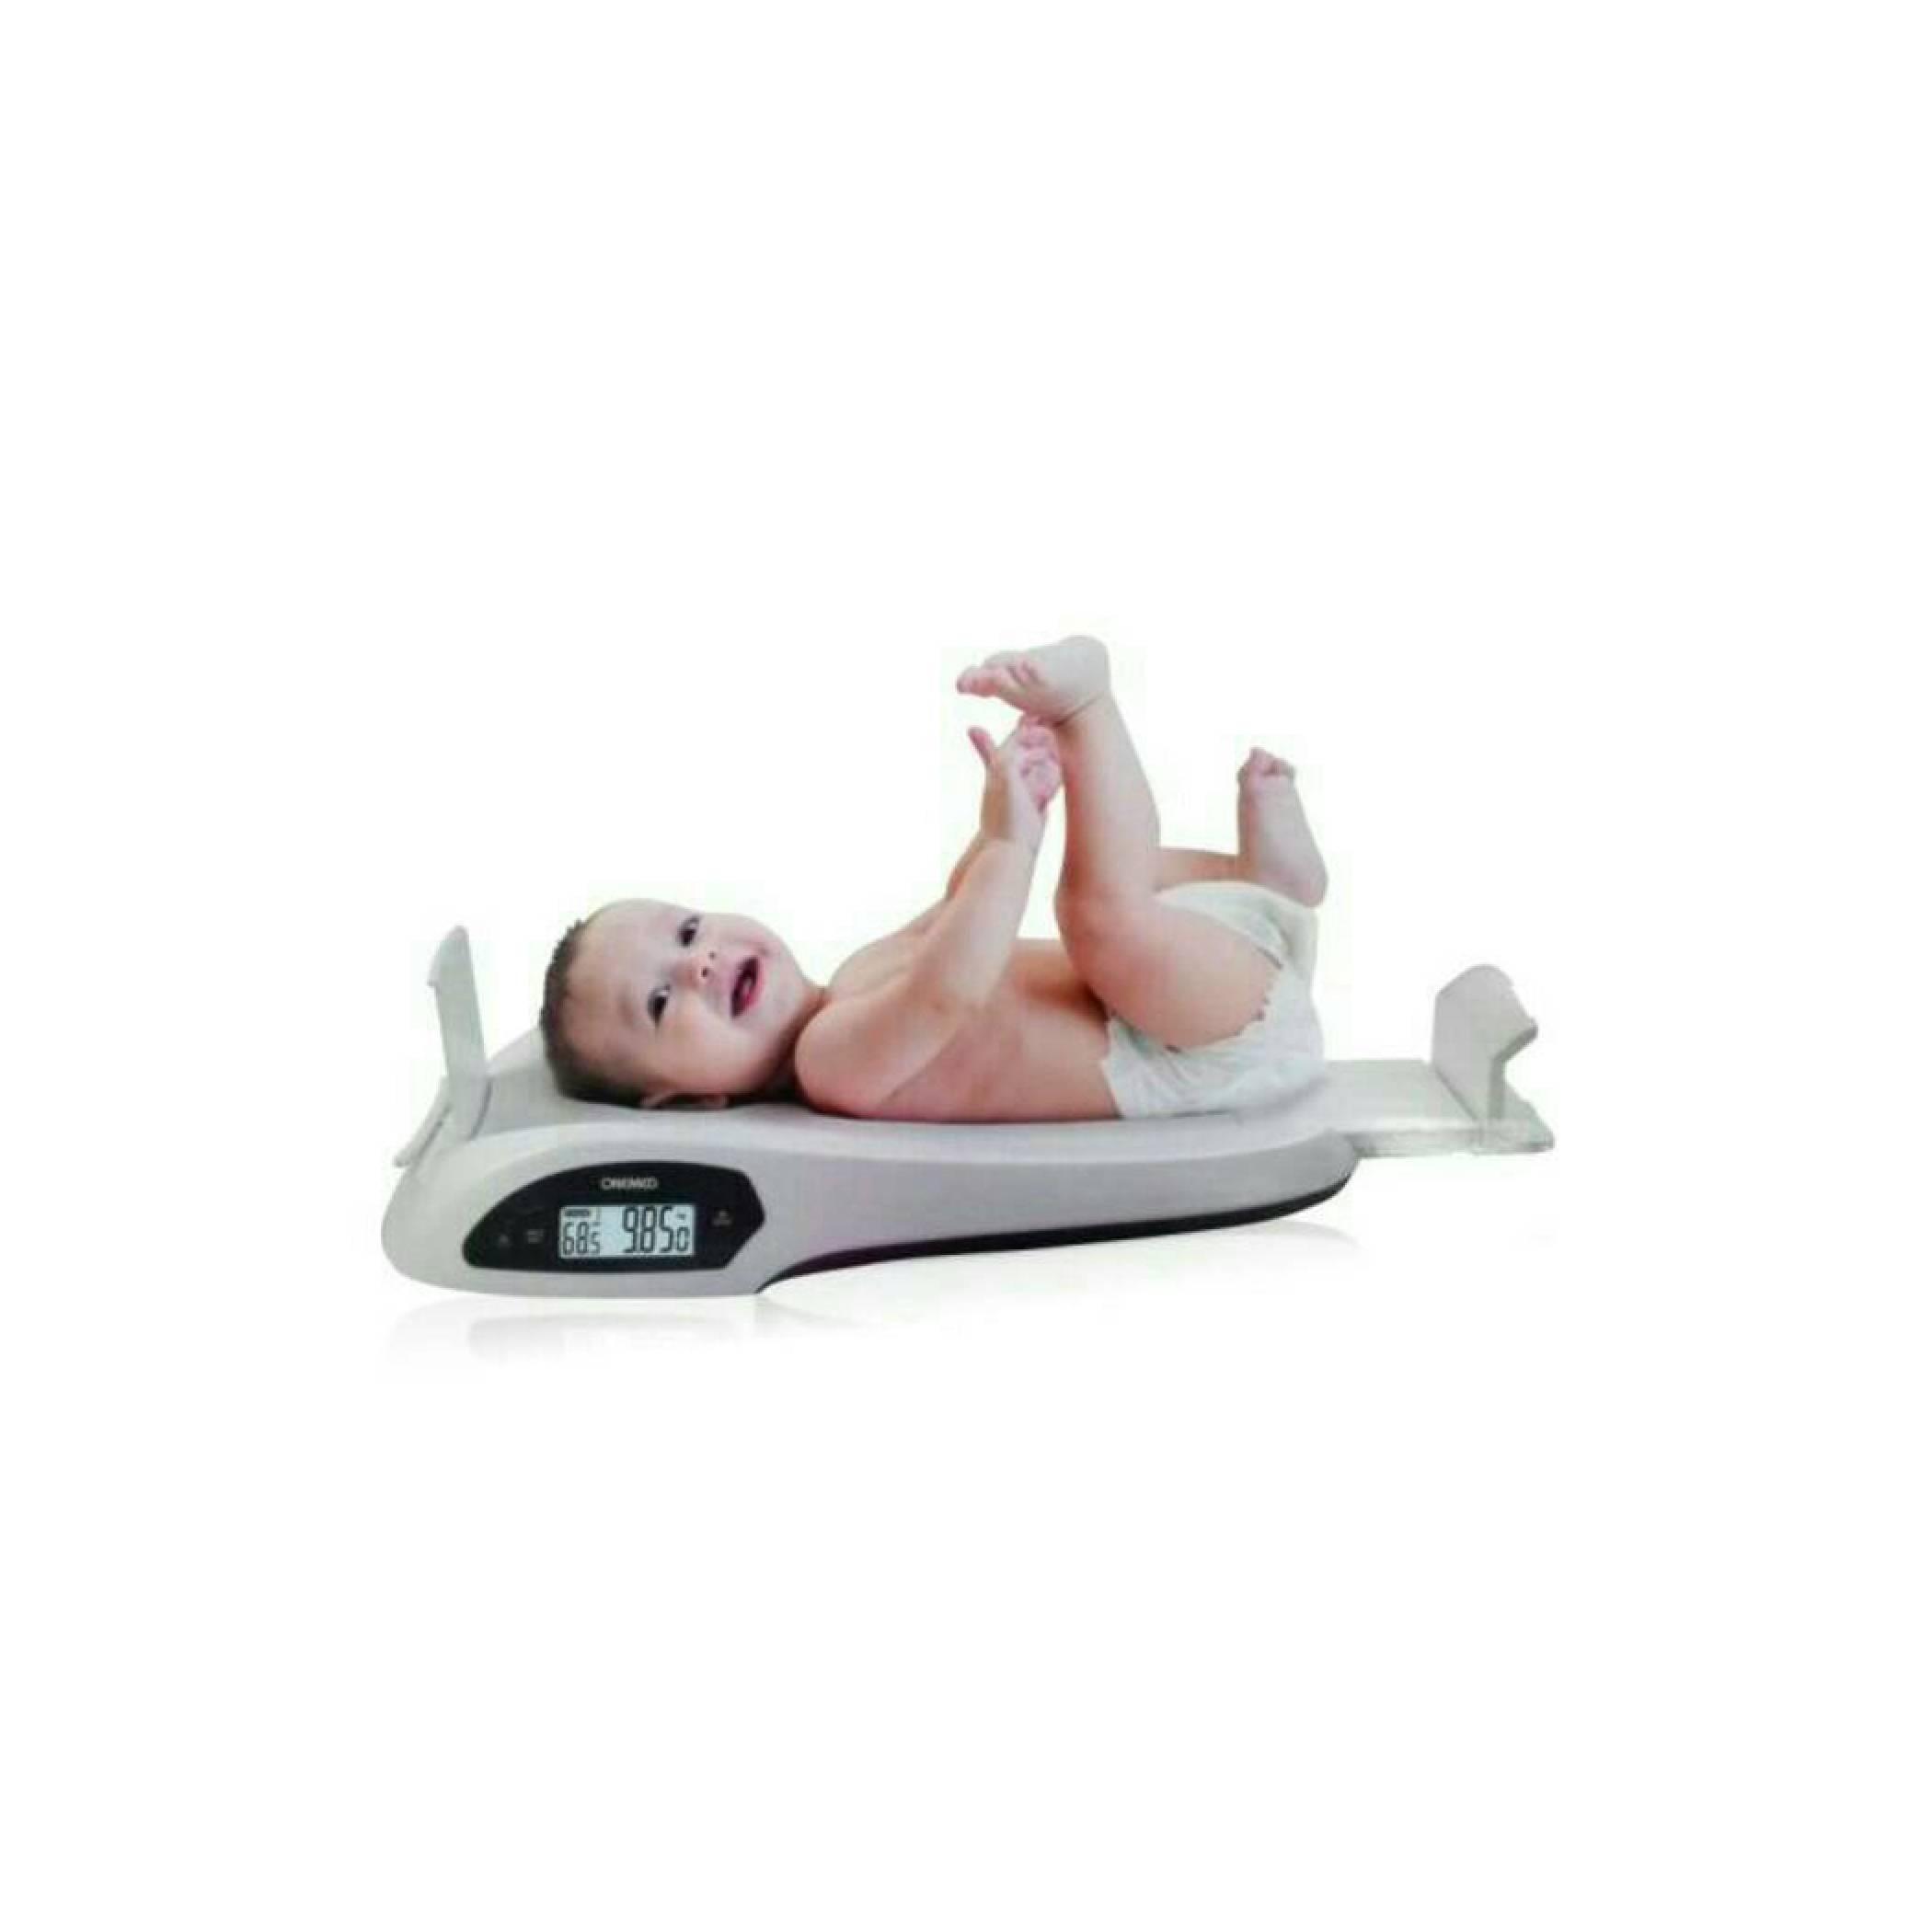 Timbangan Bayi Digital emed